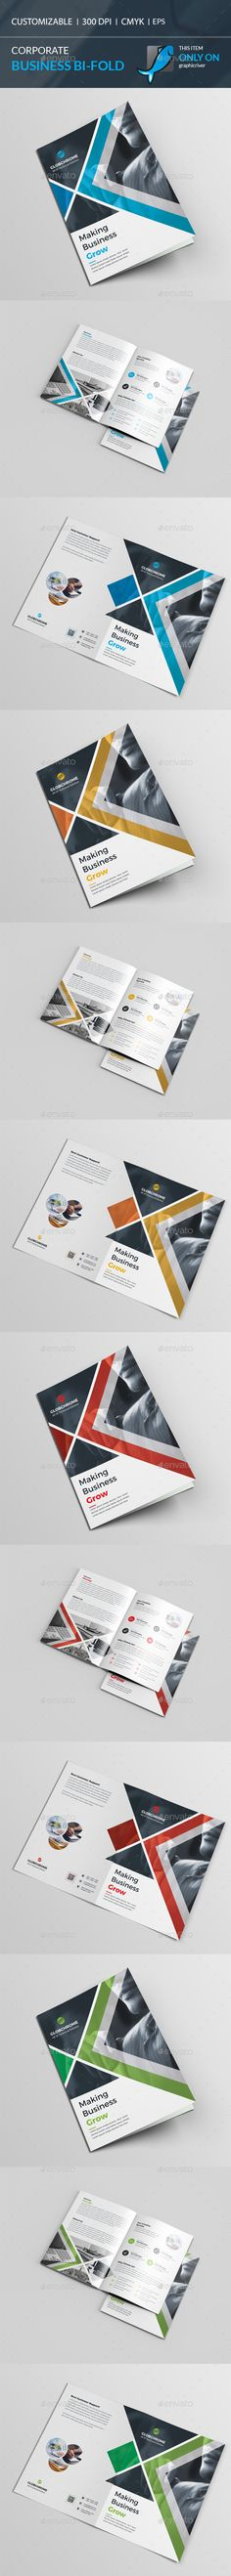 Bi-Fold Brochure Template Vector EPS, AI. Download here: http://graphicriver.net/item/bifold-brochure/15830557?ref=ksioks